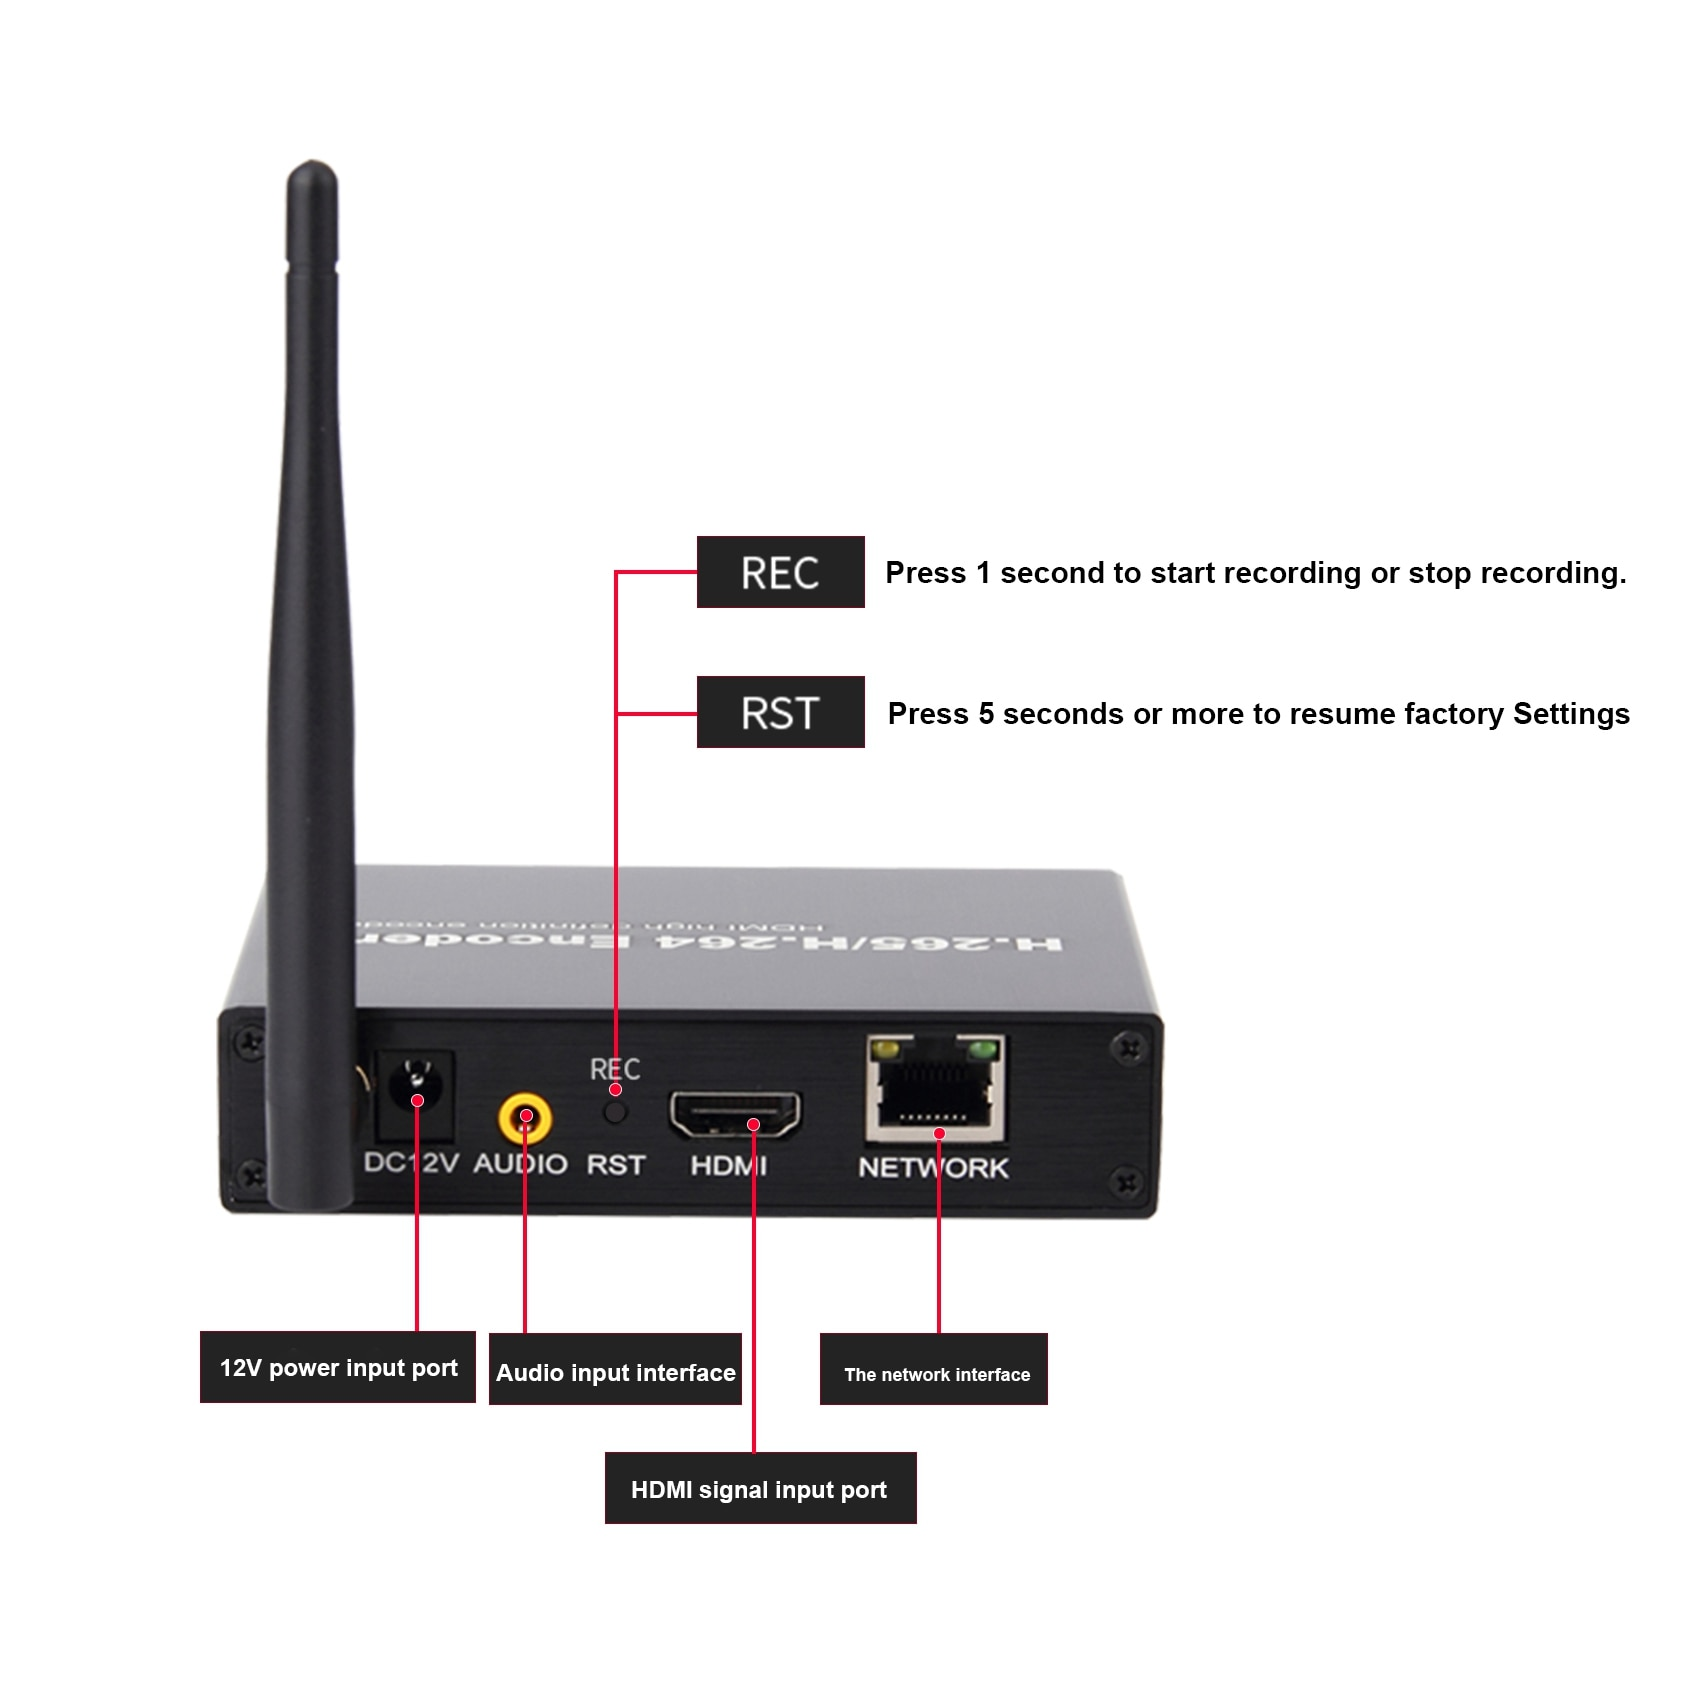 H.265 H.264 HDMI Video Audio Wifi Encoder Iptvs Rtsp Rtmp Onvif HDMI Encoder H265 for Live Streaming Broadcast(EU Plug) enlarge